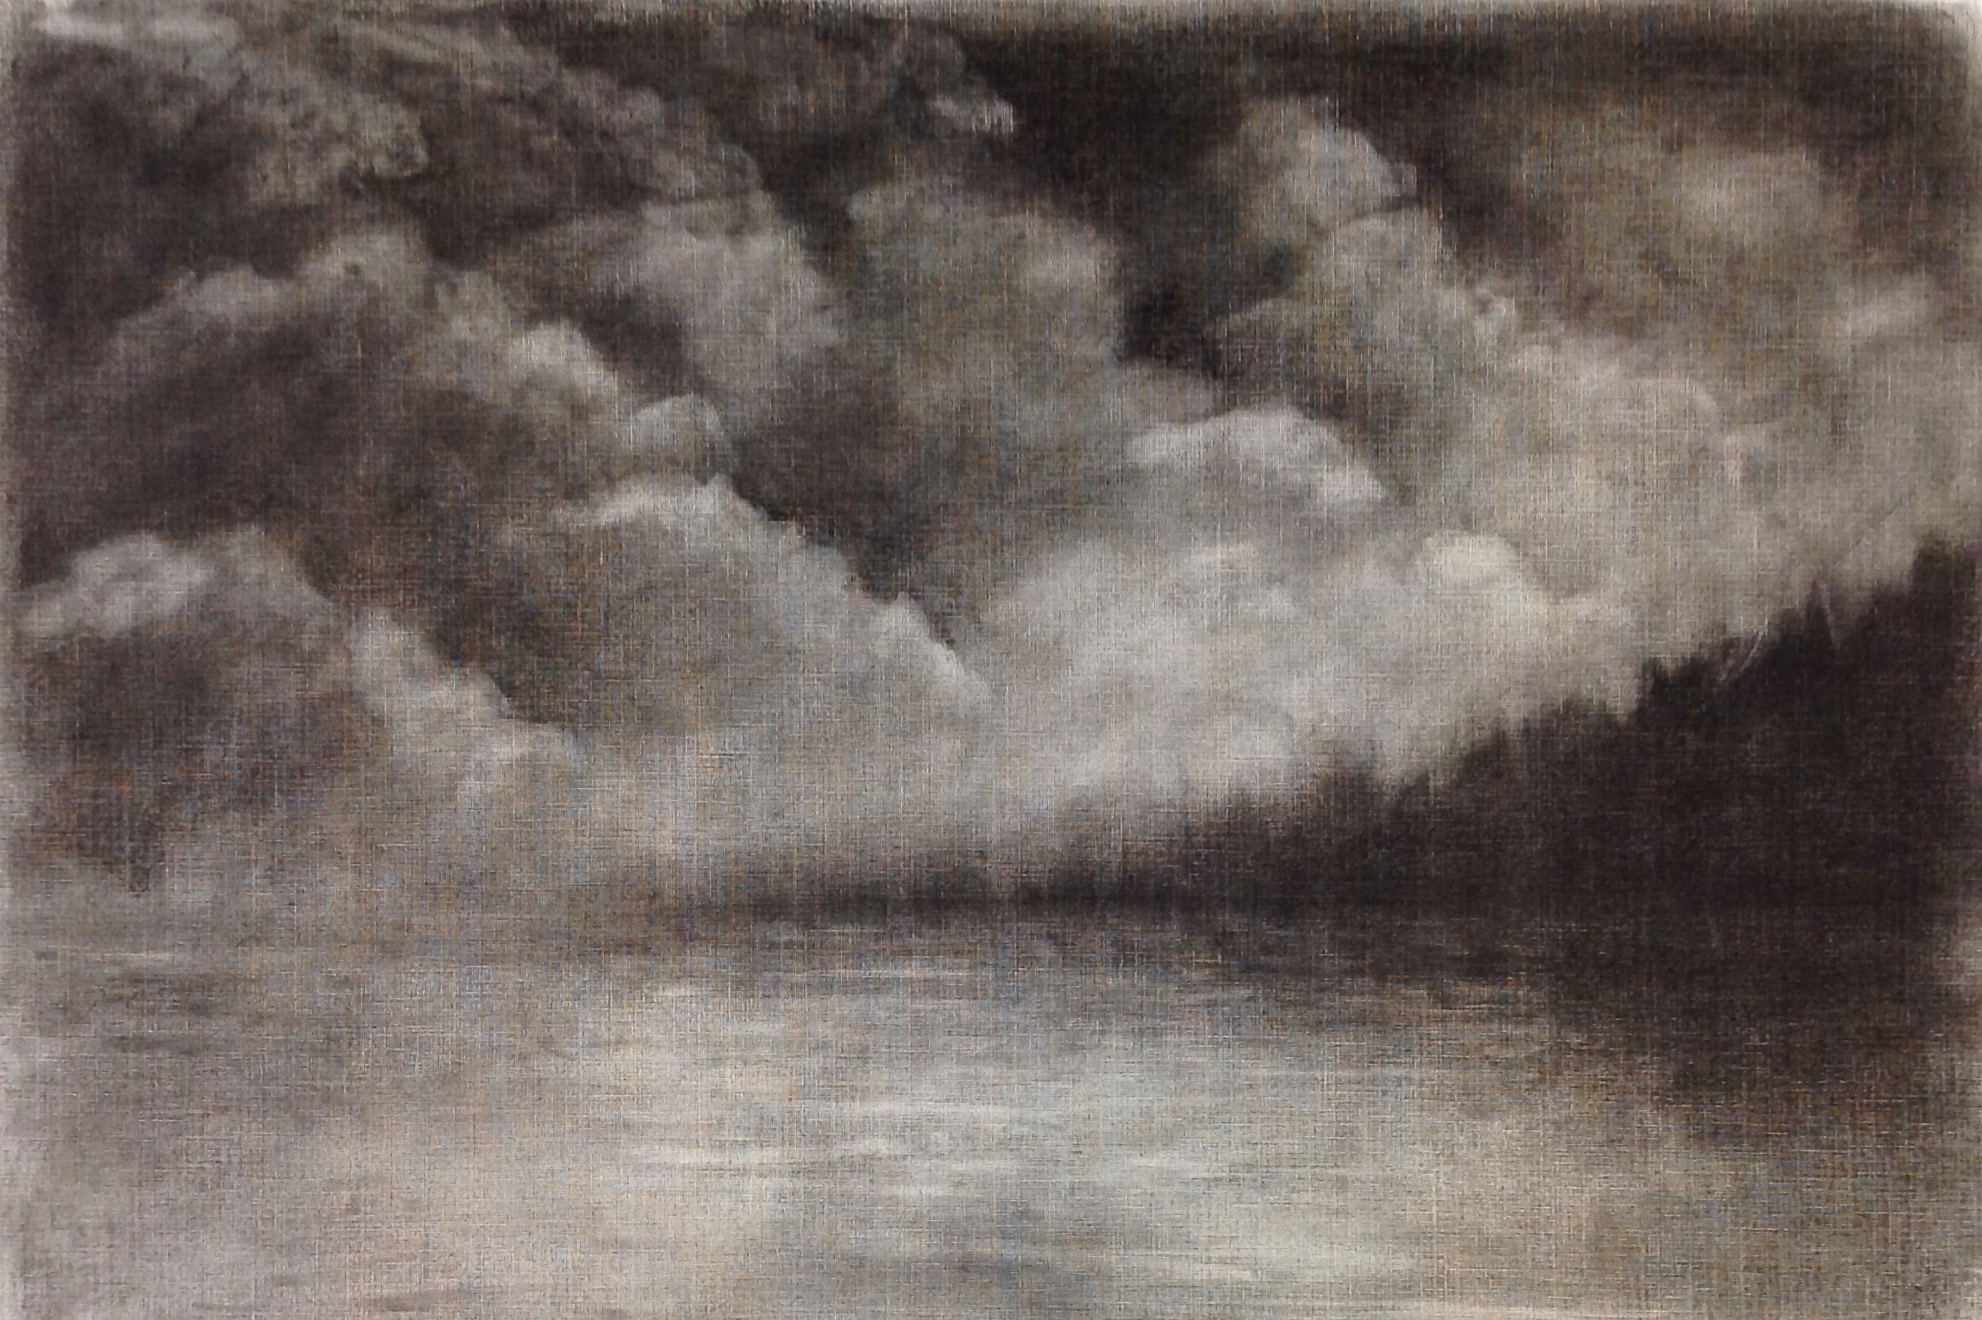 Head in the Clouds #5